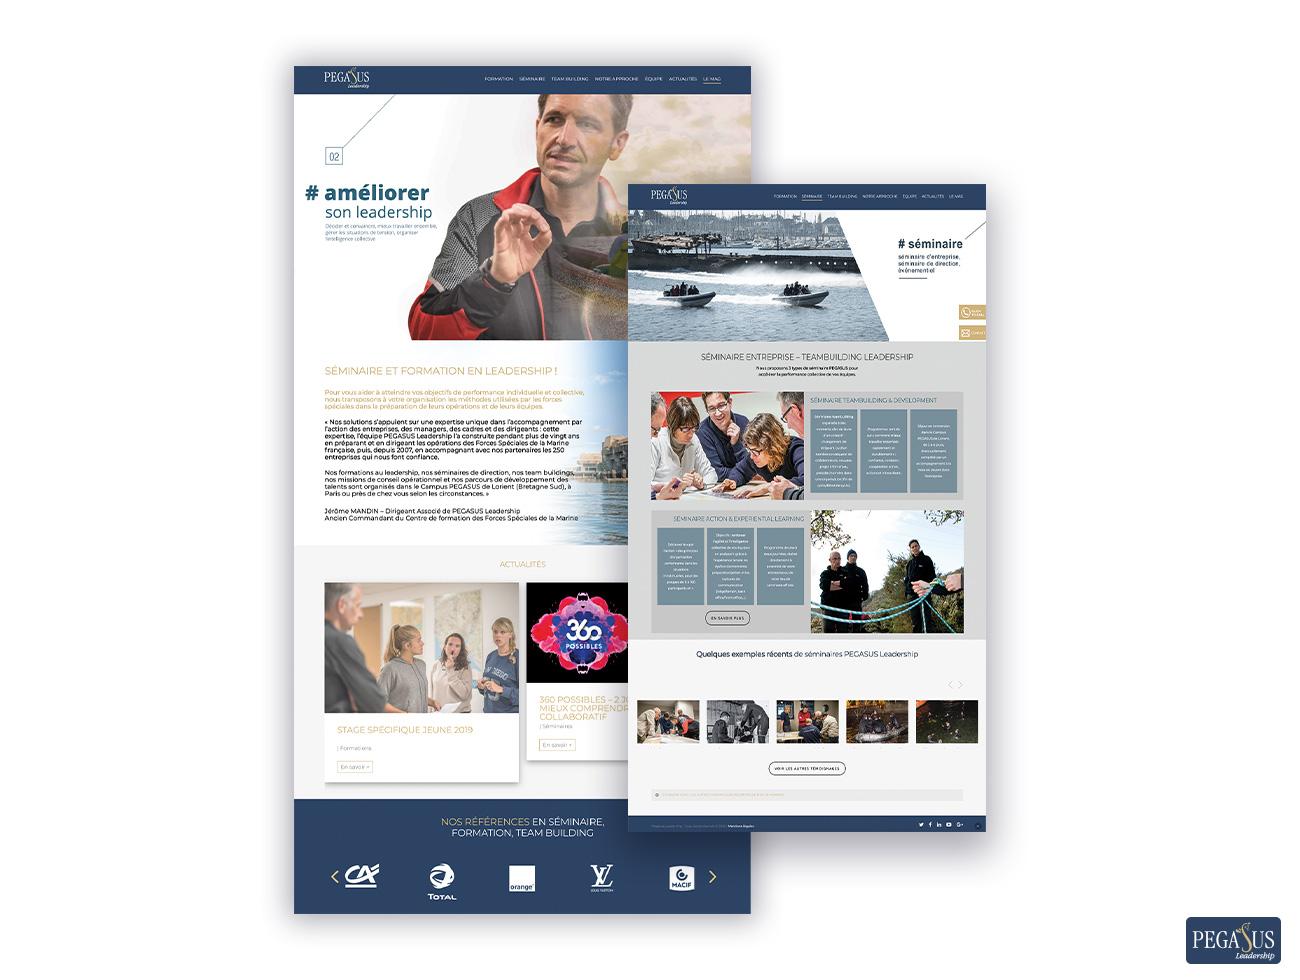 PEGASUS-Leadership-Site-communication-identité-visuelle-bretagne